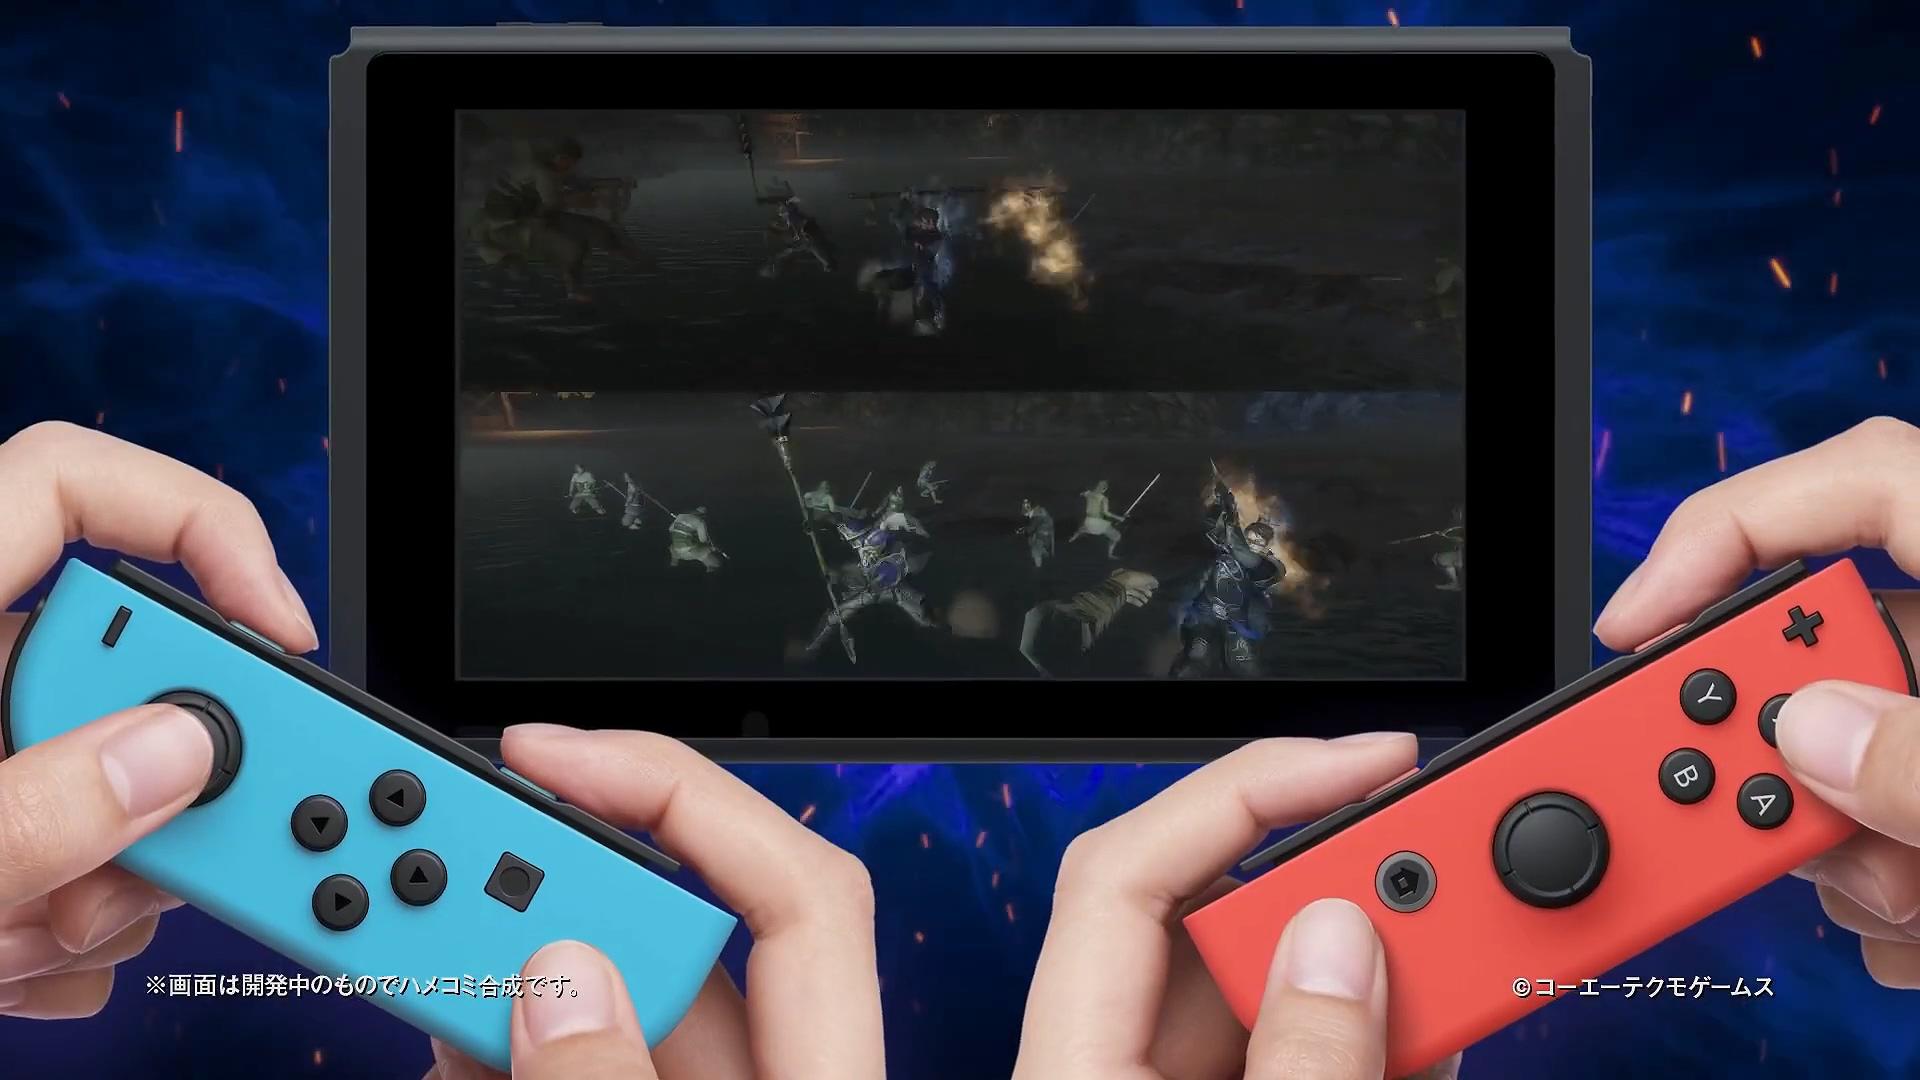 Switch《真三国无双7猛将传DX》已包含千元DLC内容